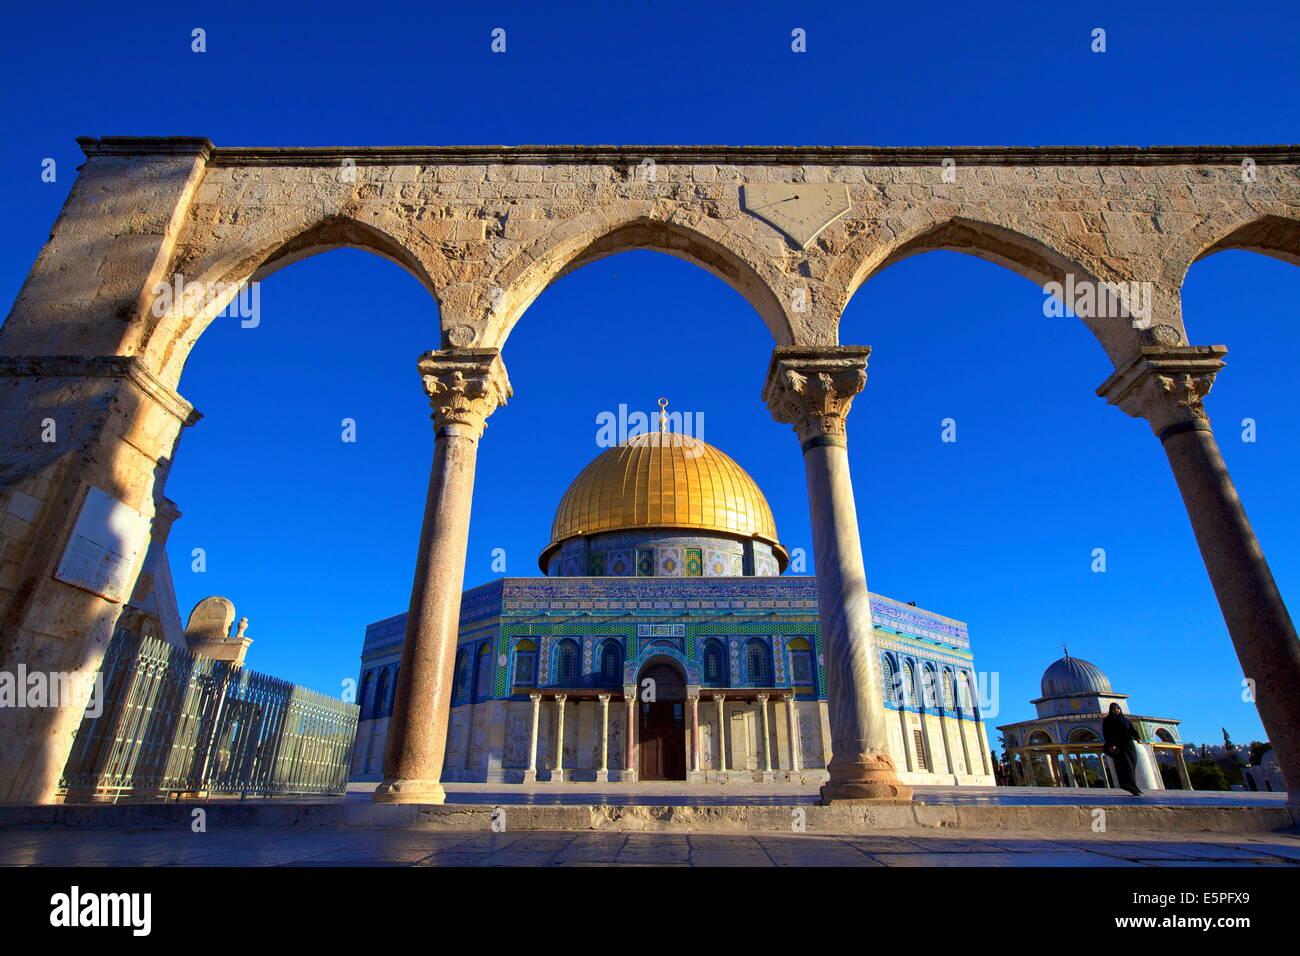 Die Kuppel des Rock, Tempelberg, UNESCO World Heritage Site, Jerusalem, Israel, Nahost Stockbild